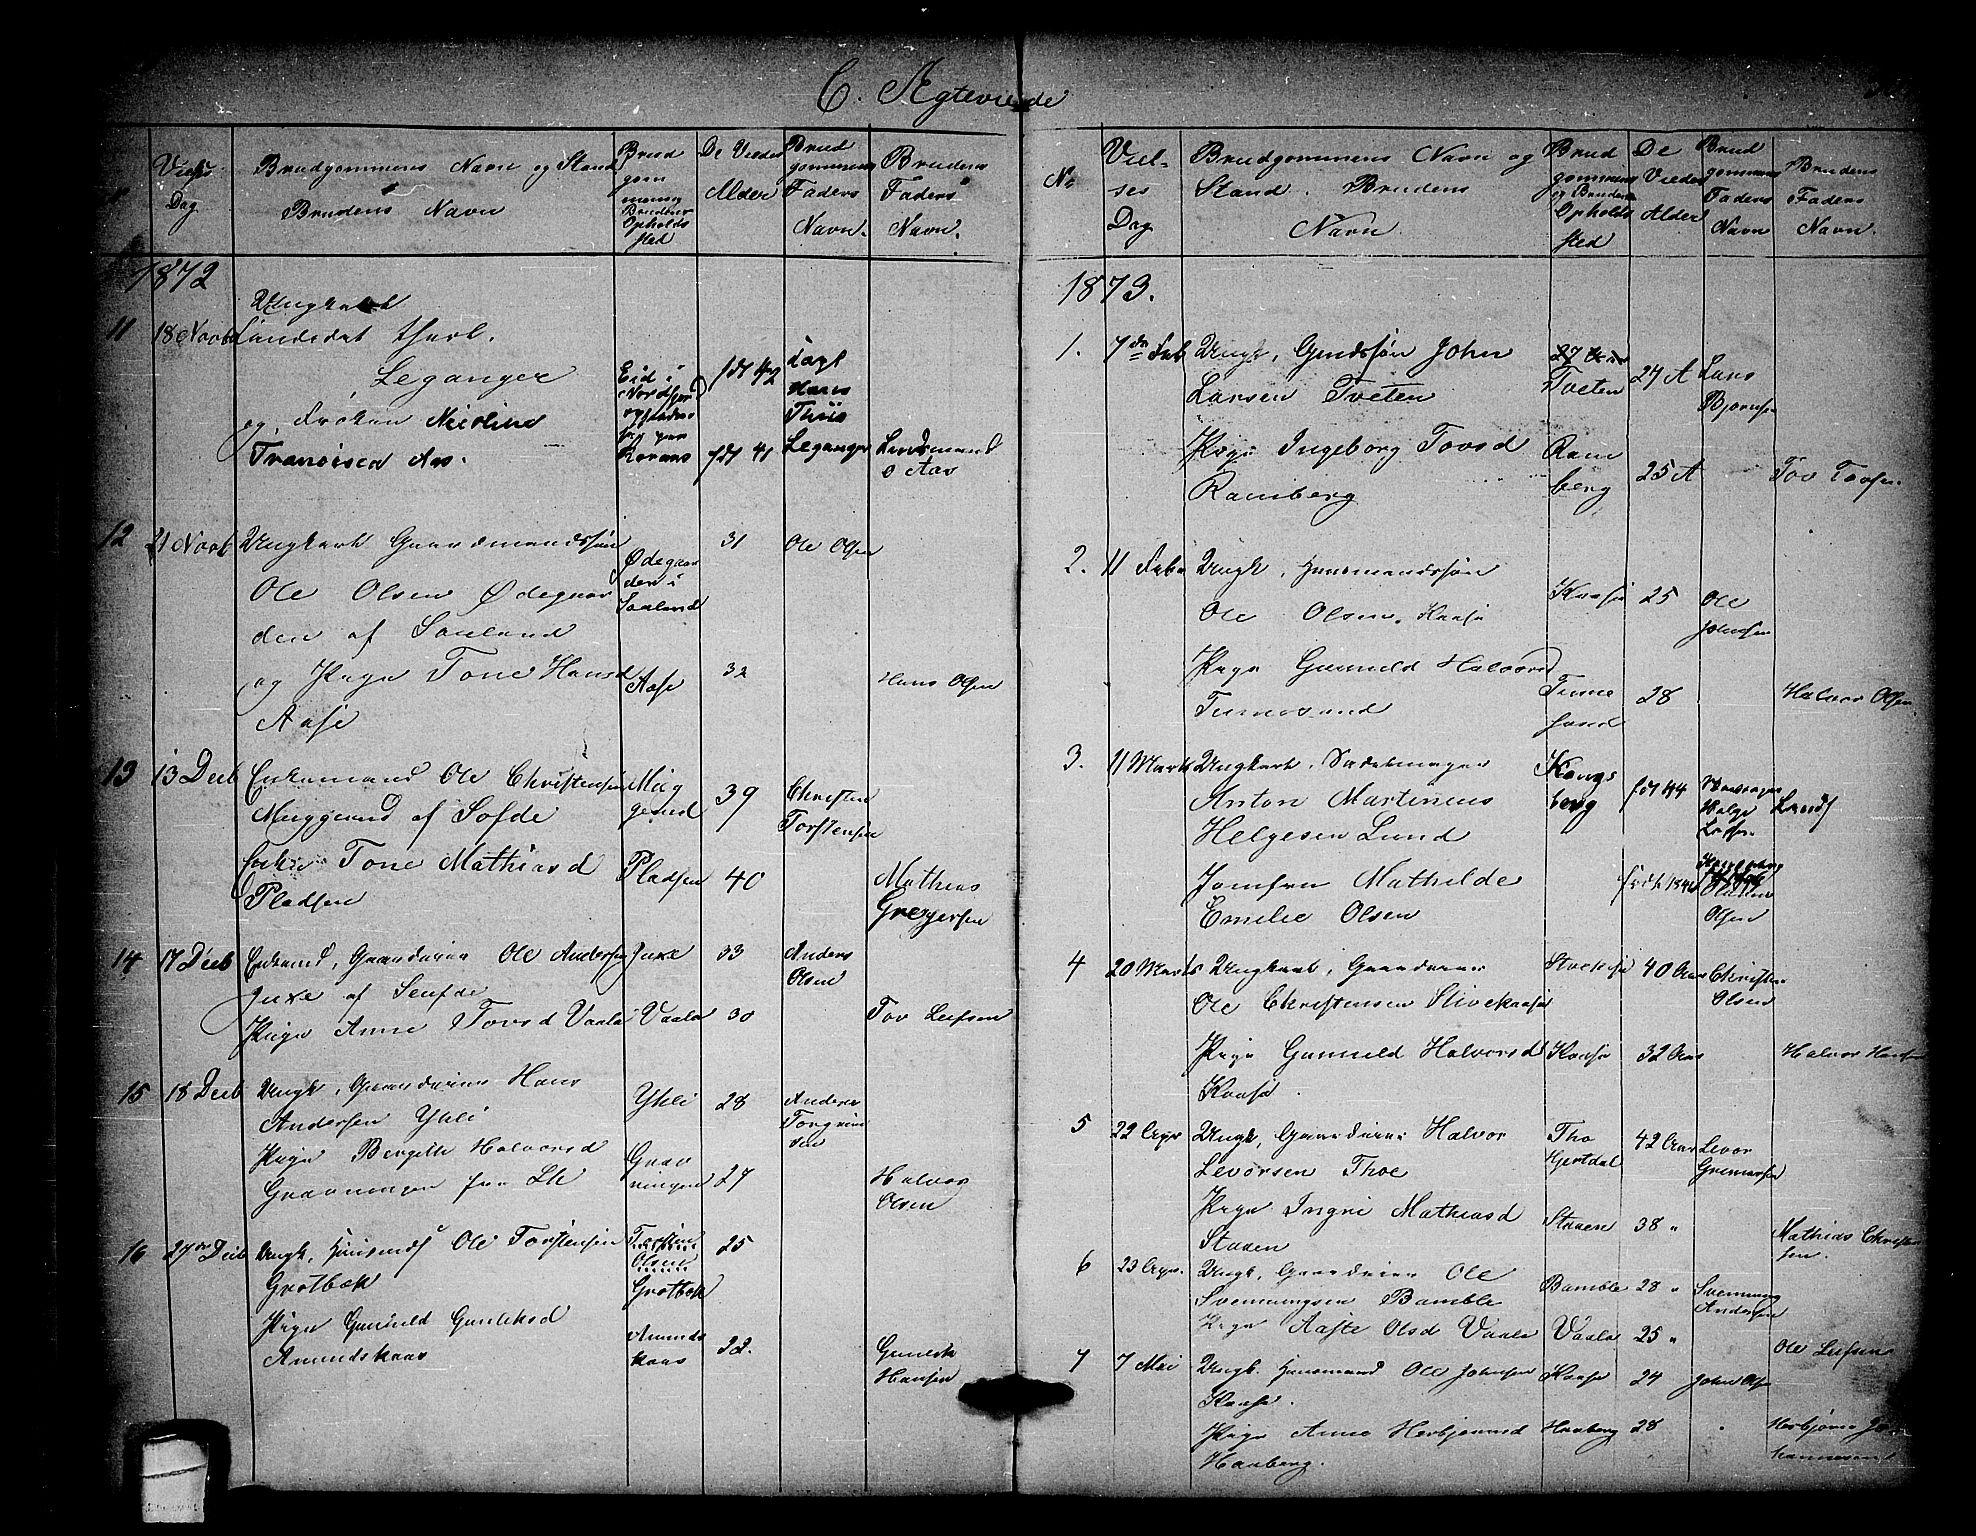 SAKO, Heddal kirkebøker, G/Ga/L0001: Klokkerbok nr. I 1, 1866-1878, s. 308-309